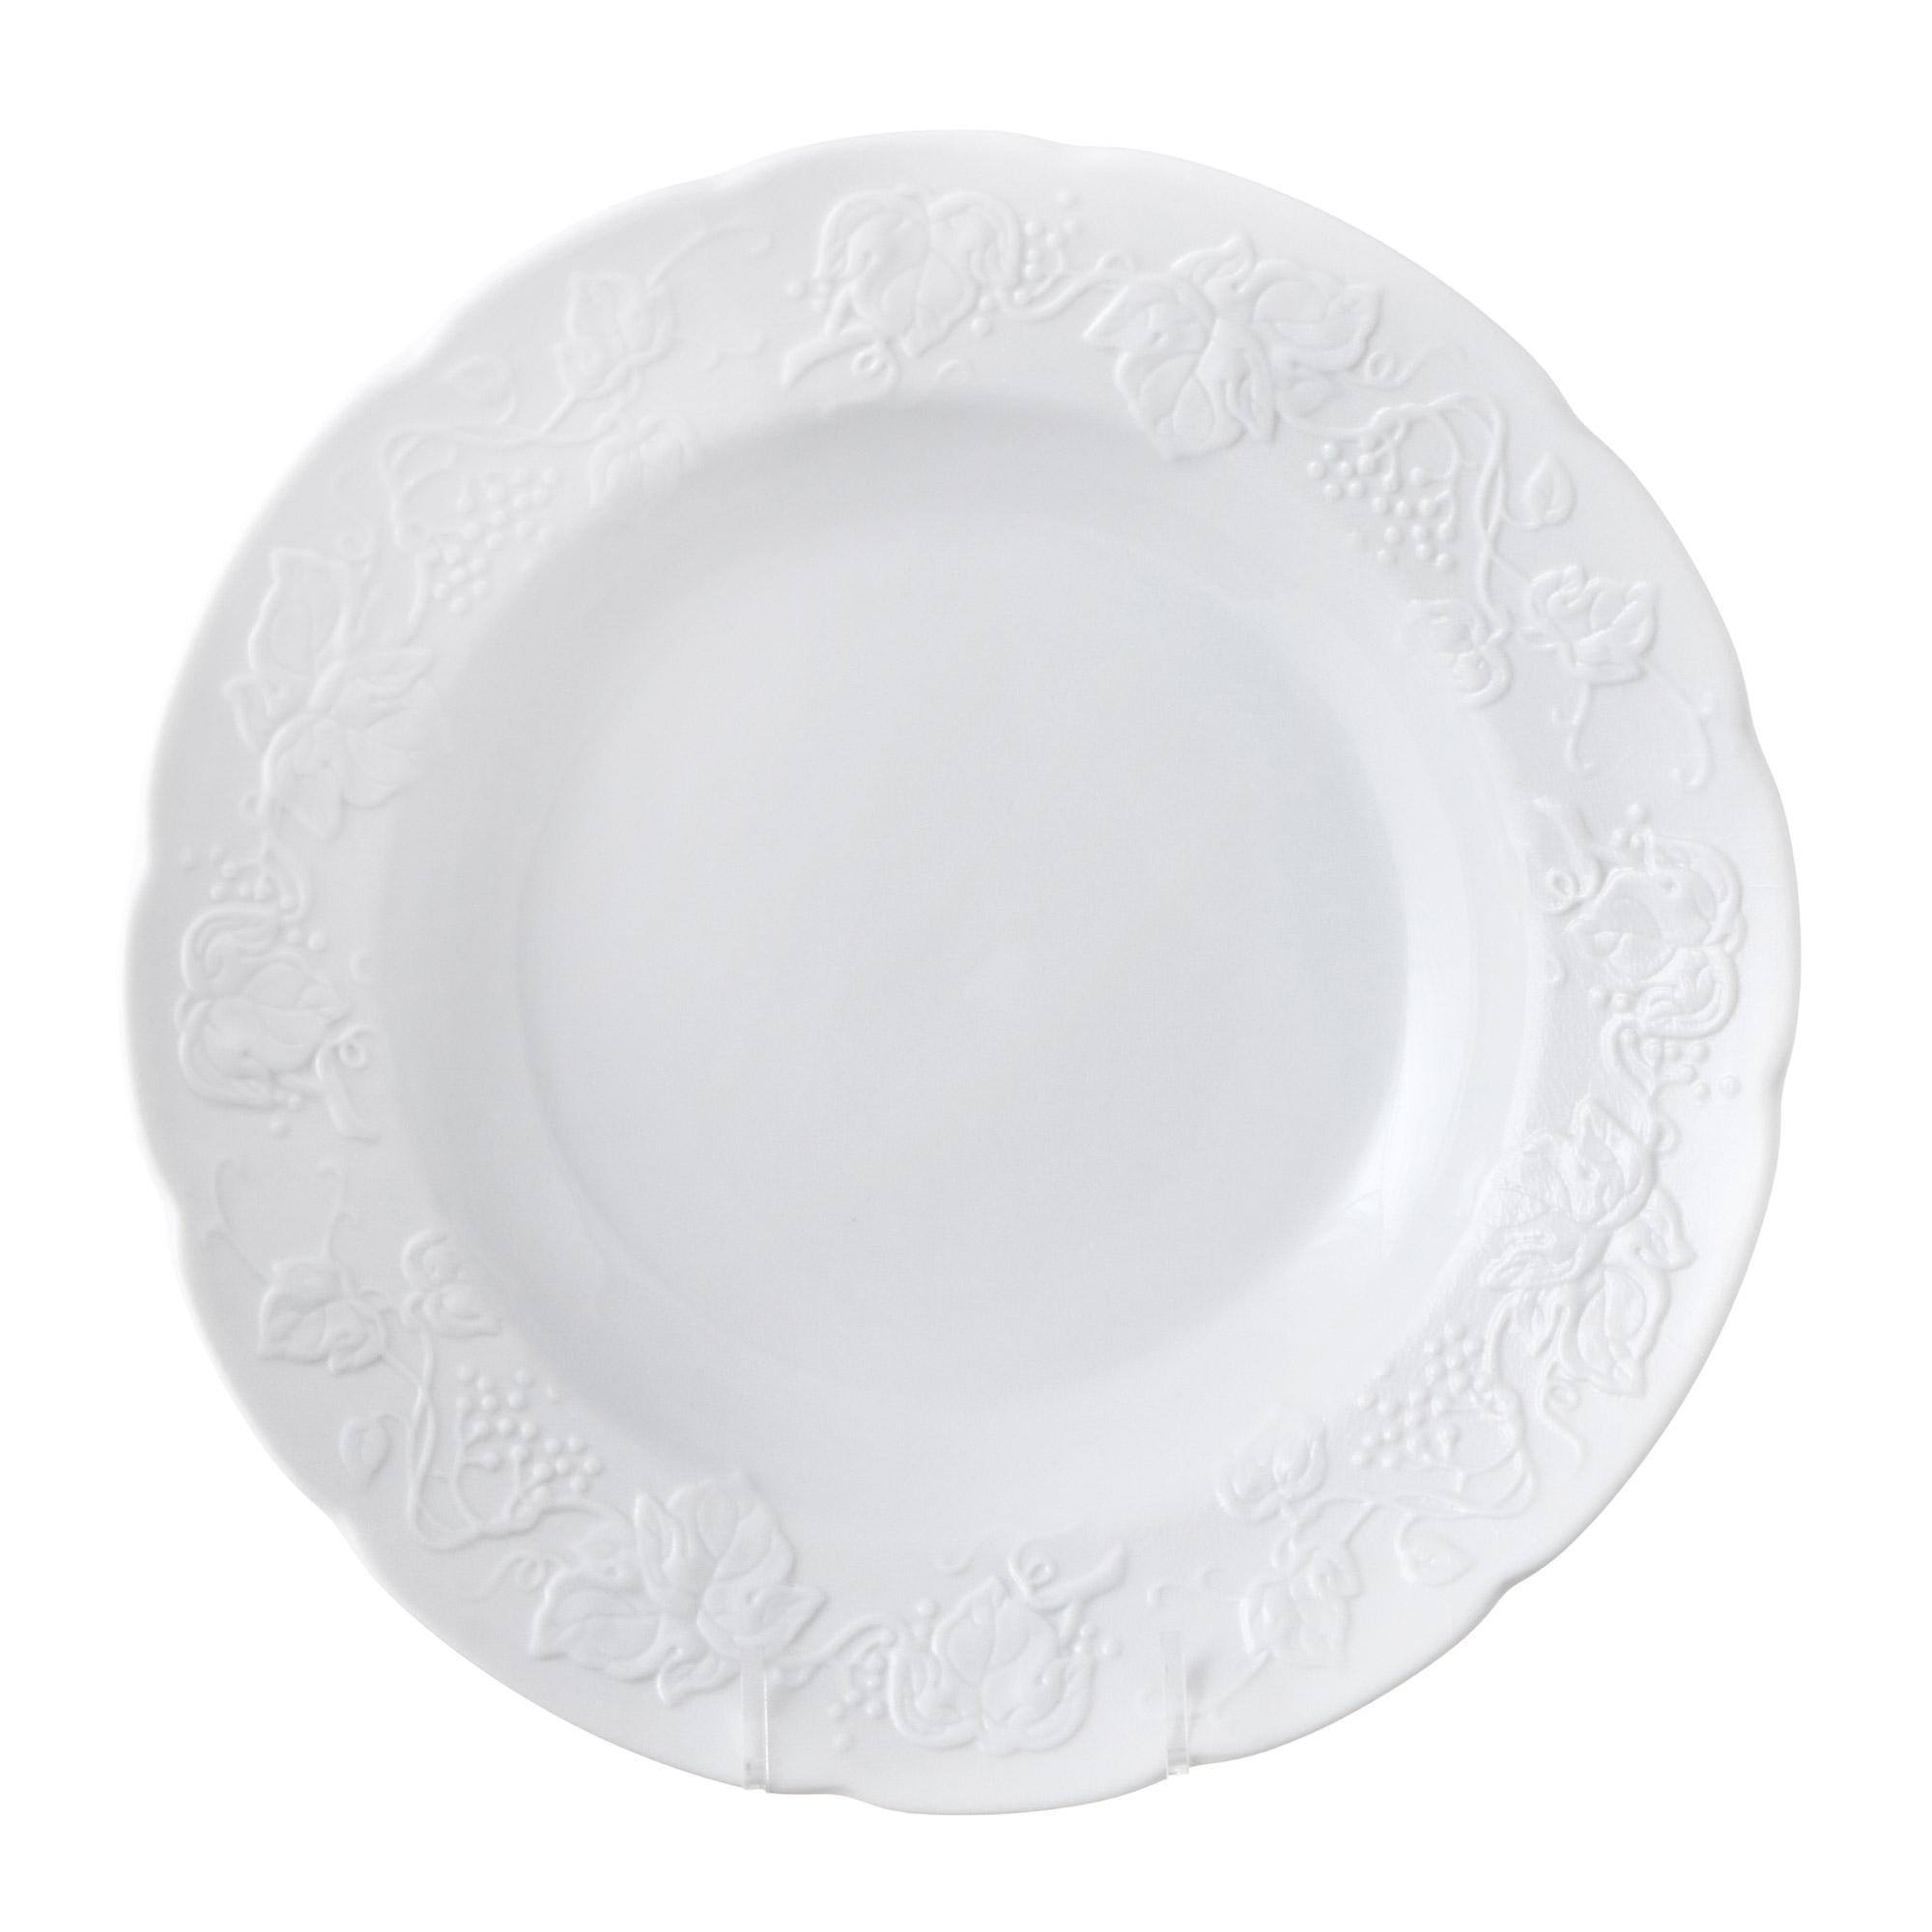 Тарелка Yves de la Rosiere глубокая Blanc 22 см